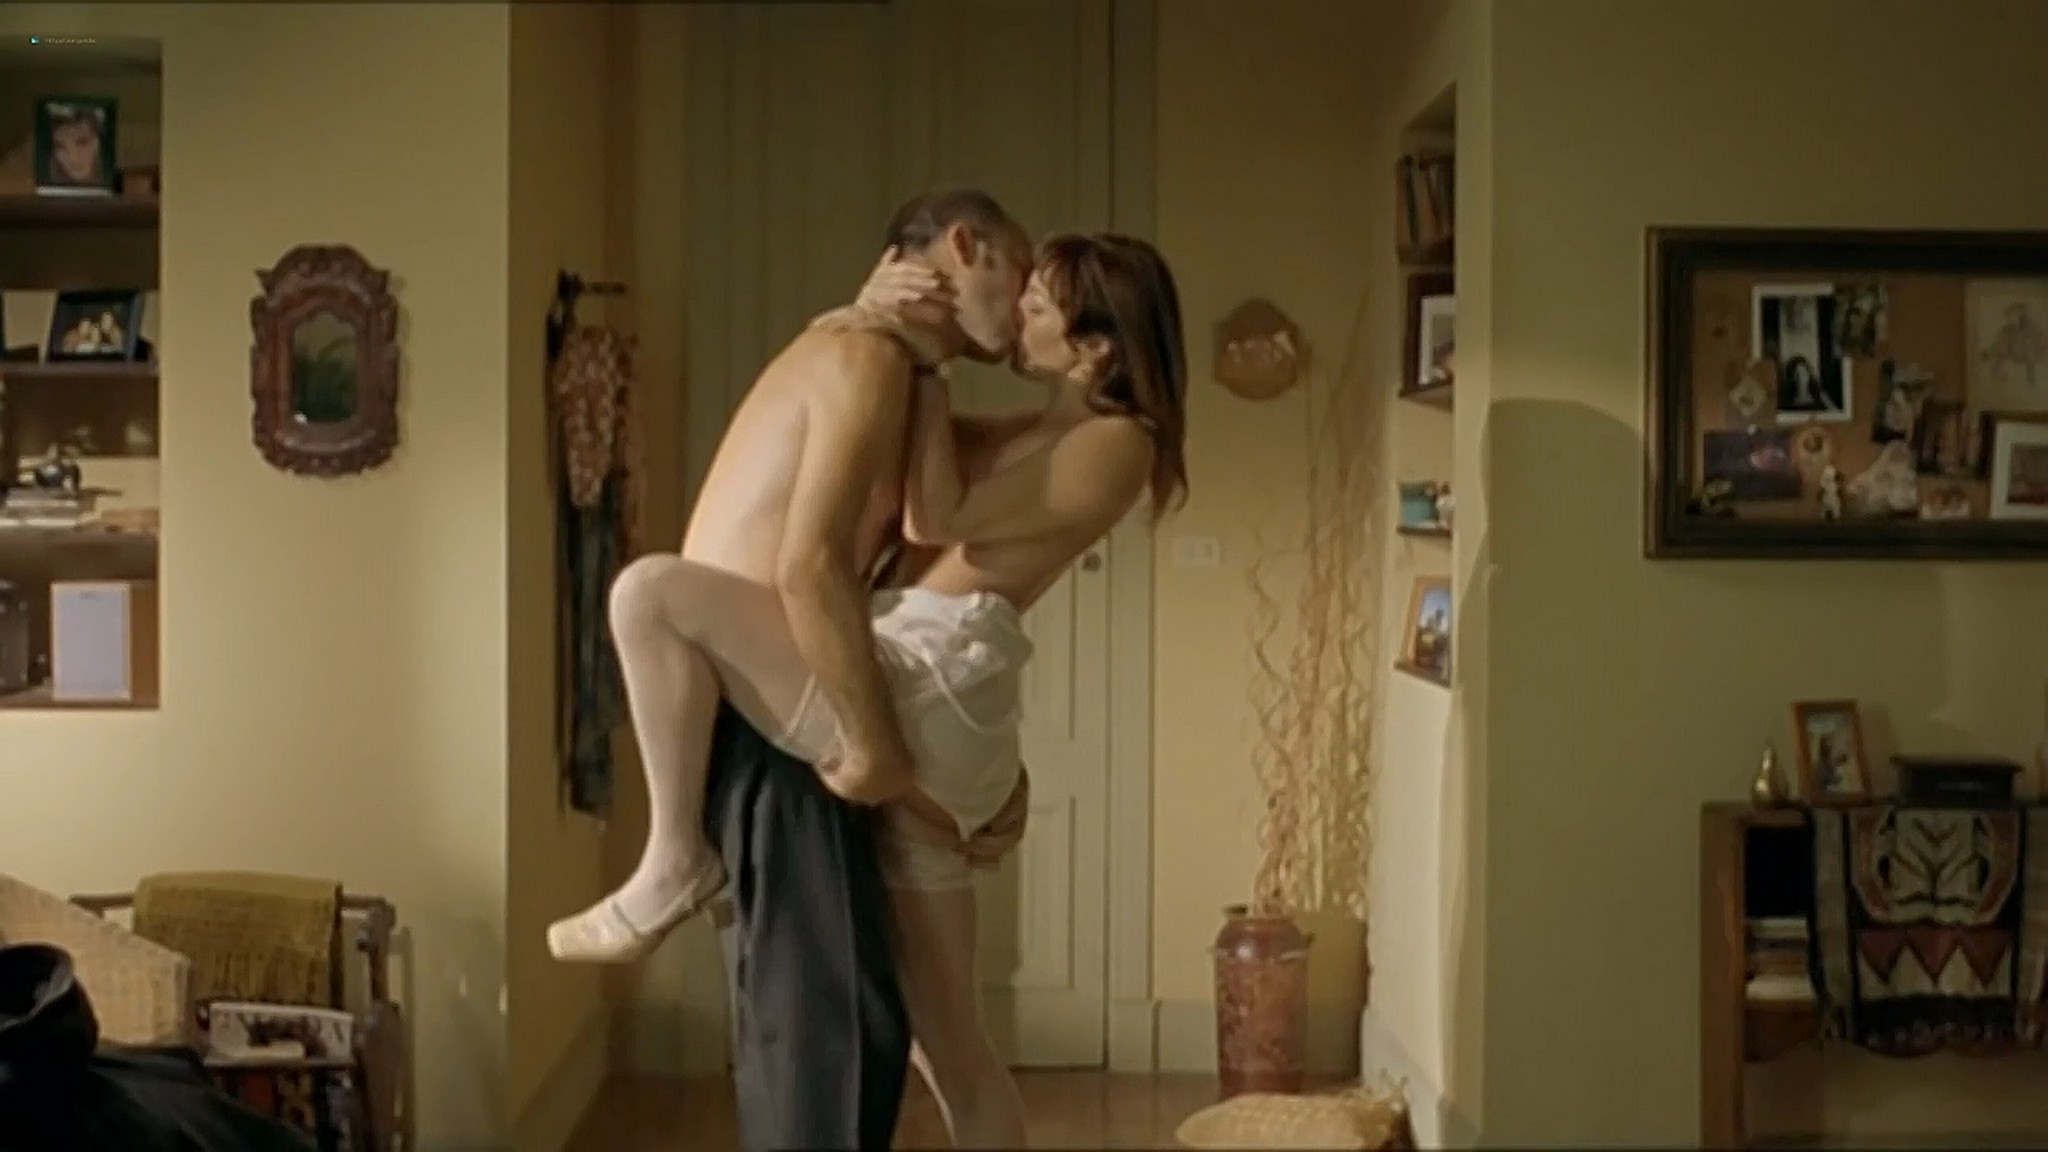 Ariadna Gil nude sex Sandra Ballesteros and other nude and sex El lado oscuro del corazon 2 AR 2001 720p 10